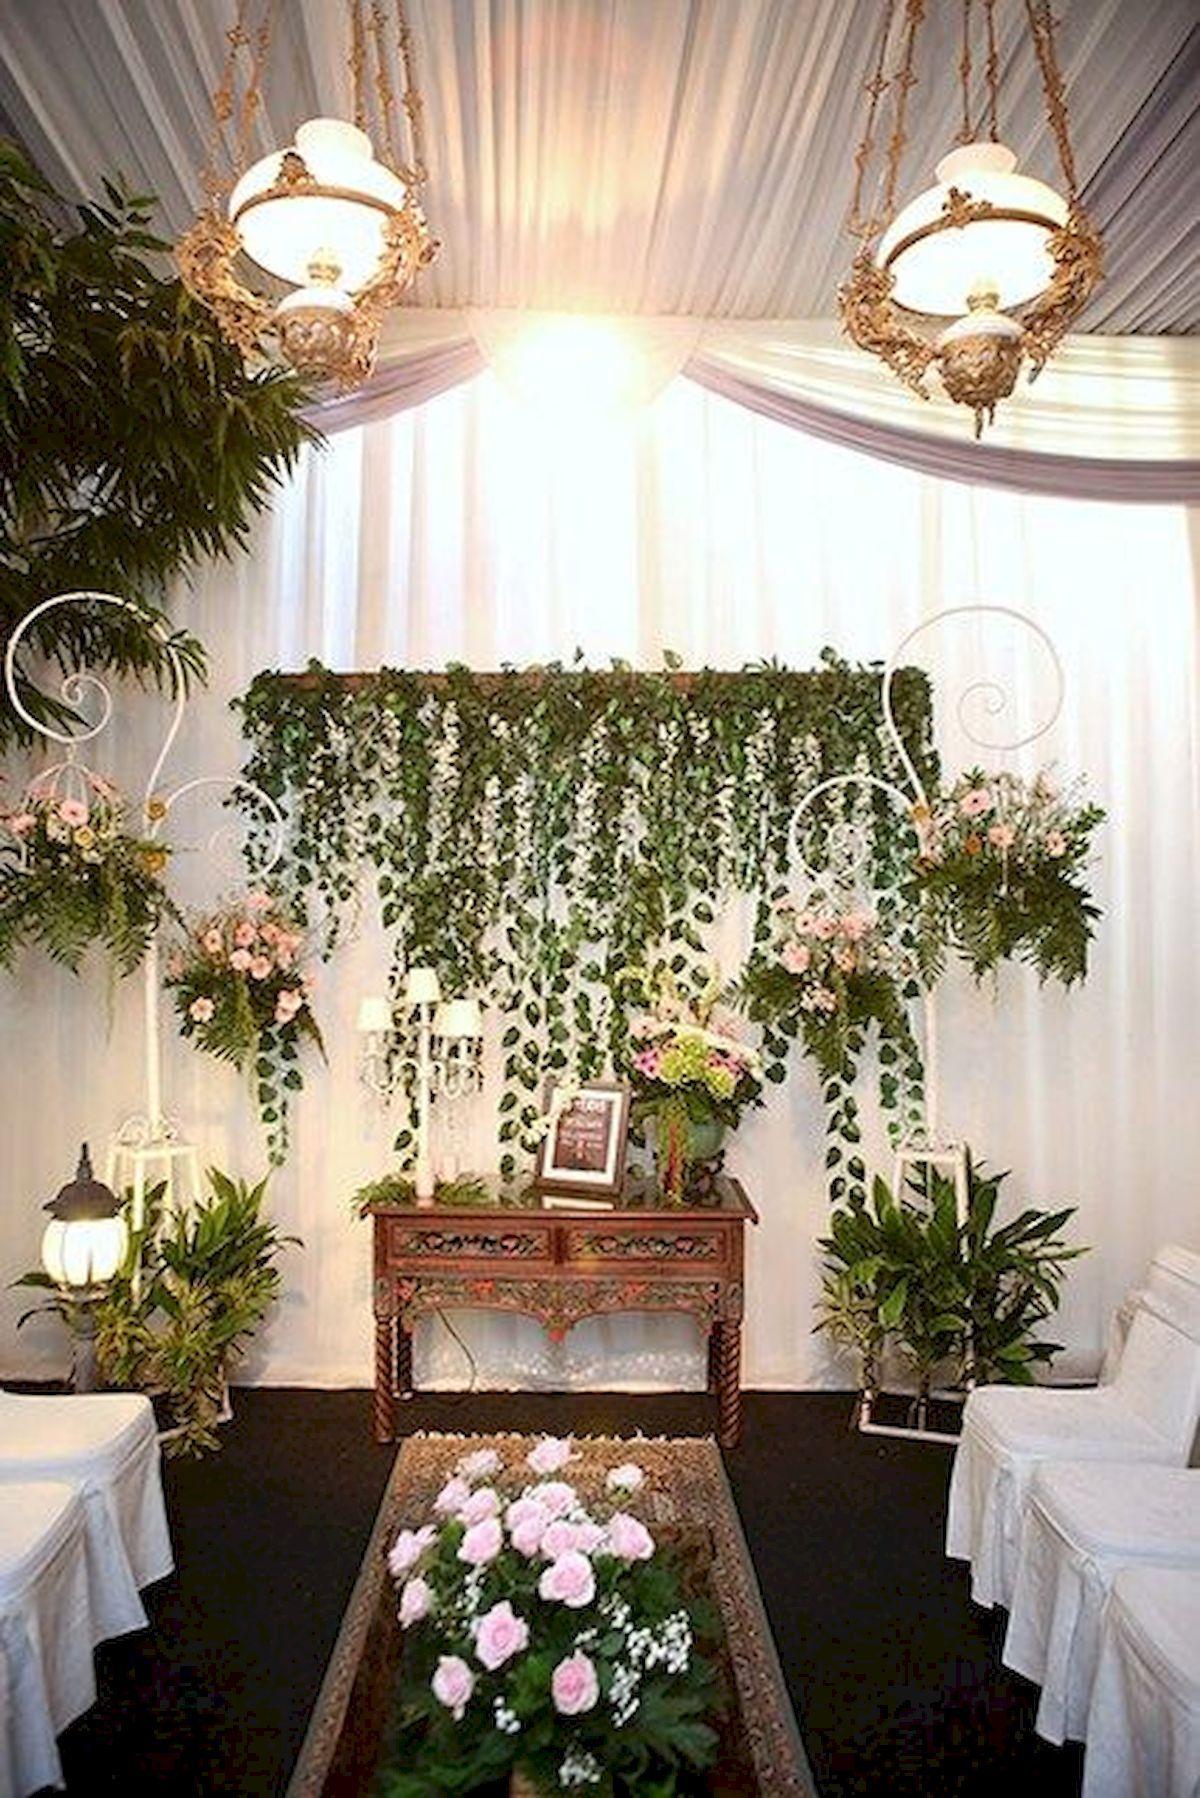 Outdoor Wedding Decoration Ideas jihanshanum PARTY IDEAS